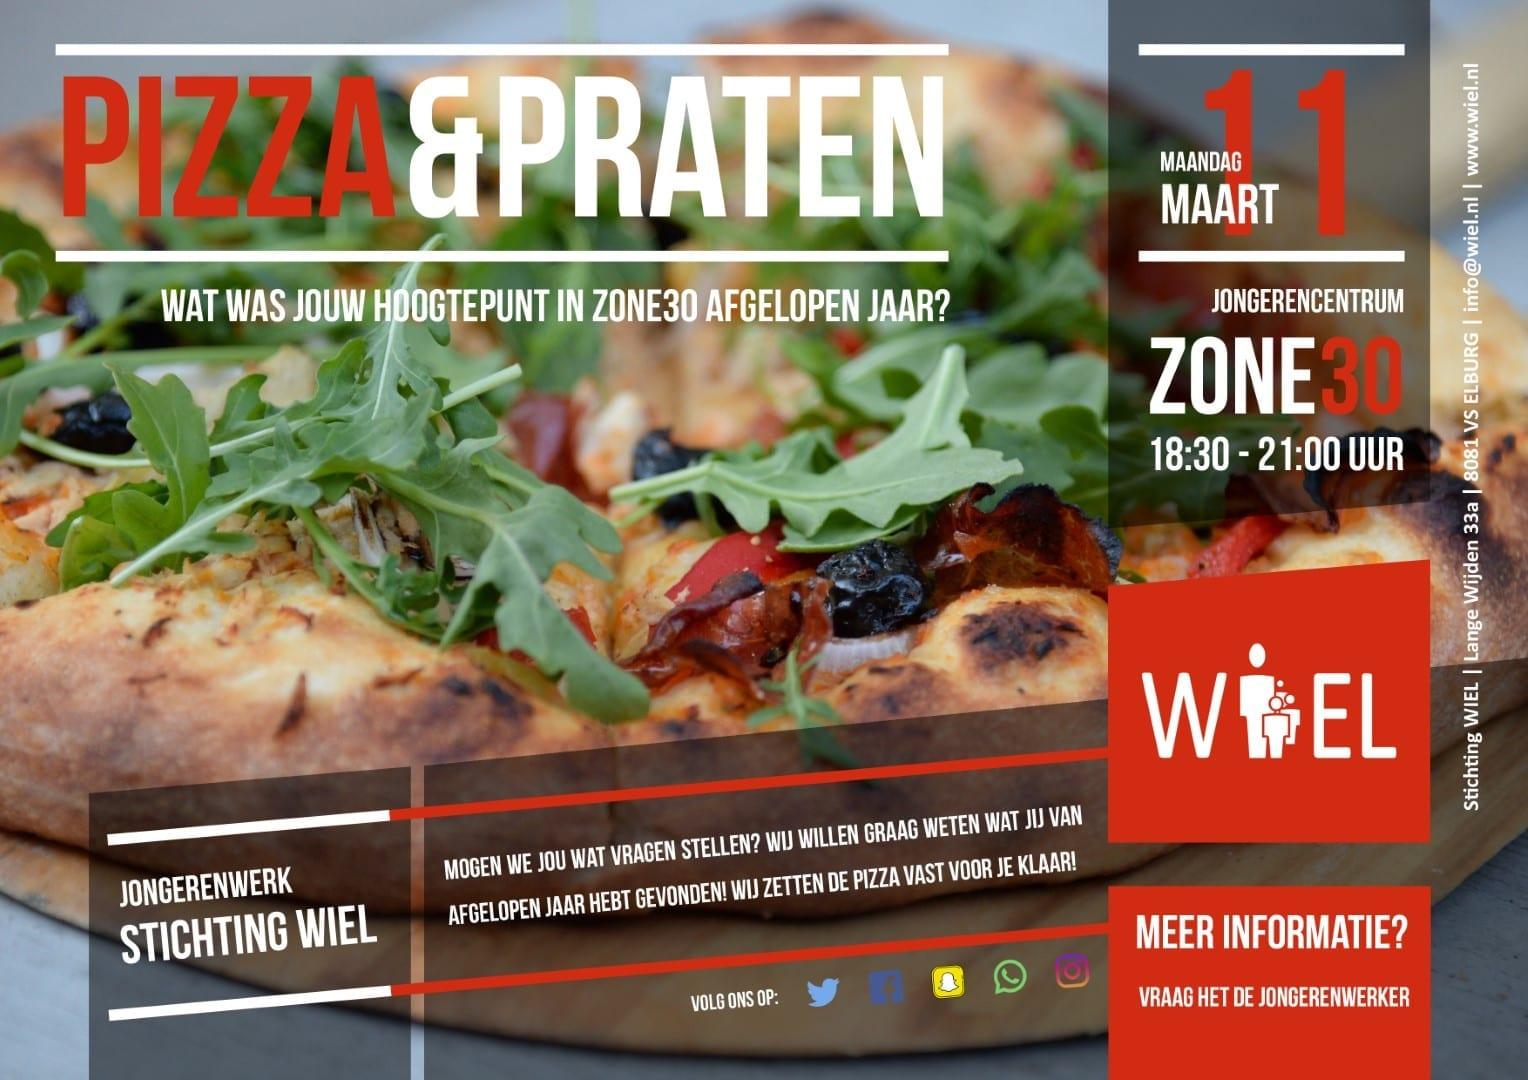 Pizza & Praten